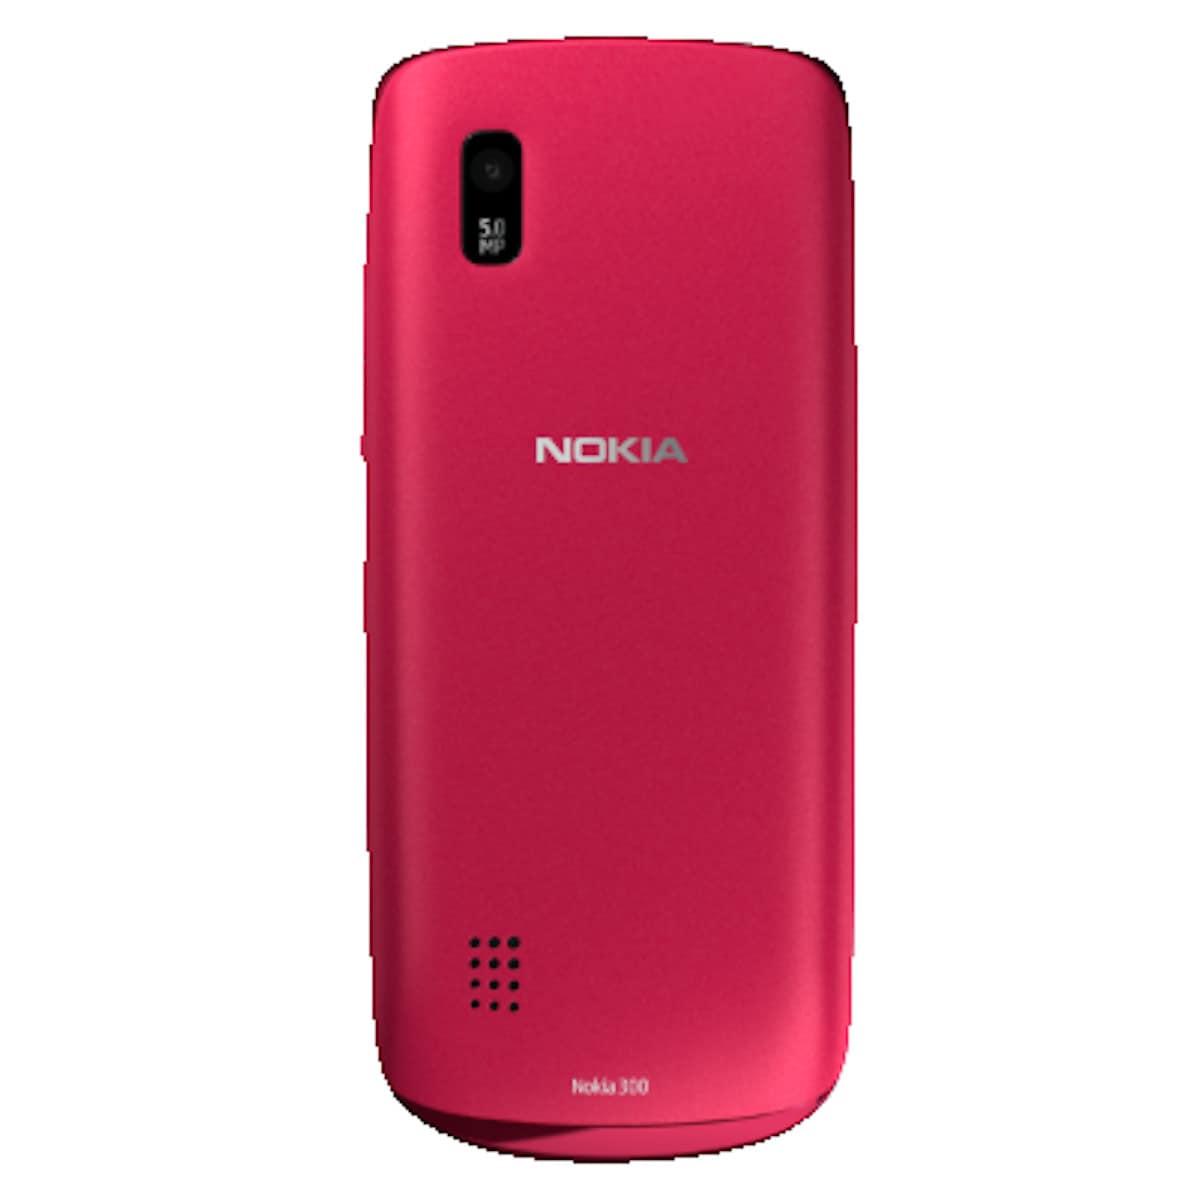 Mobiltelefon Nokia Asha 300